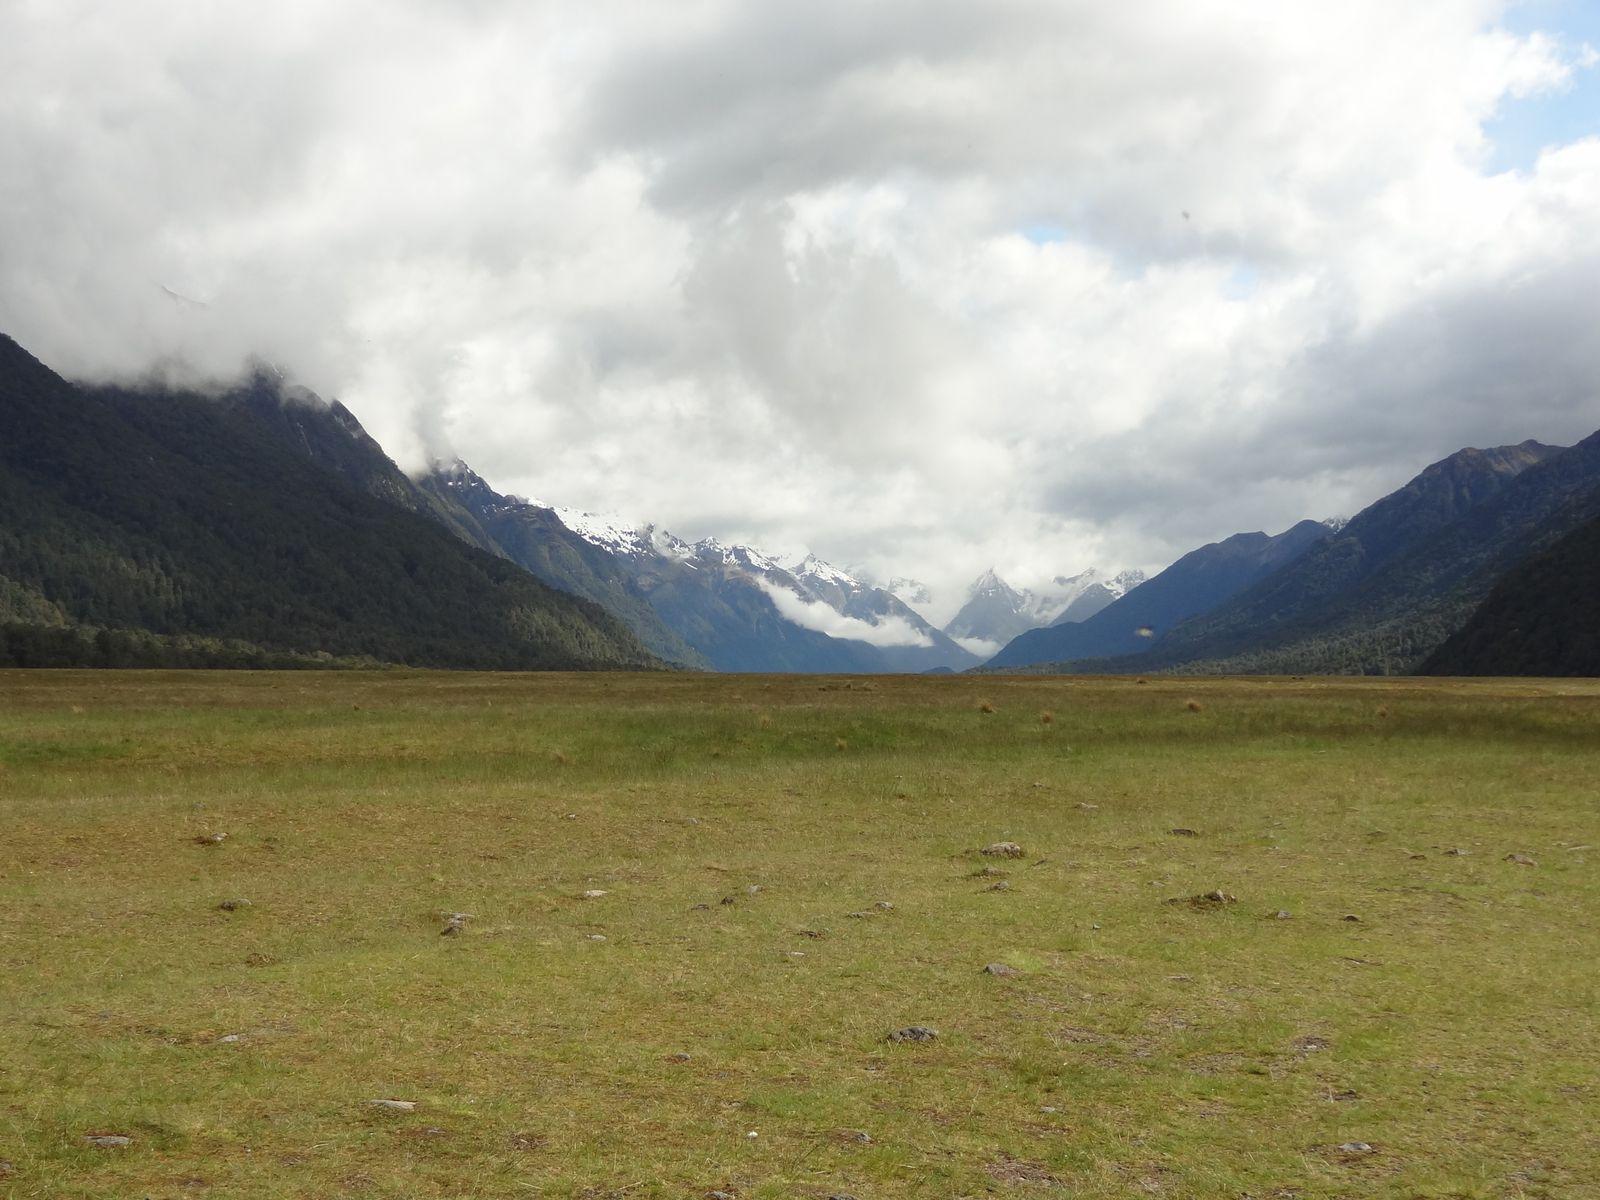 Sur la route Te Anau à Milford Sound - 26 novembre 2012